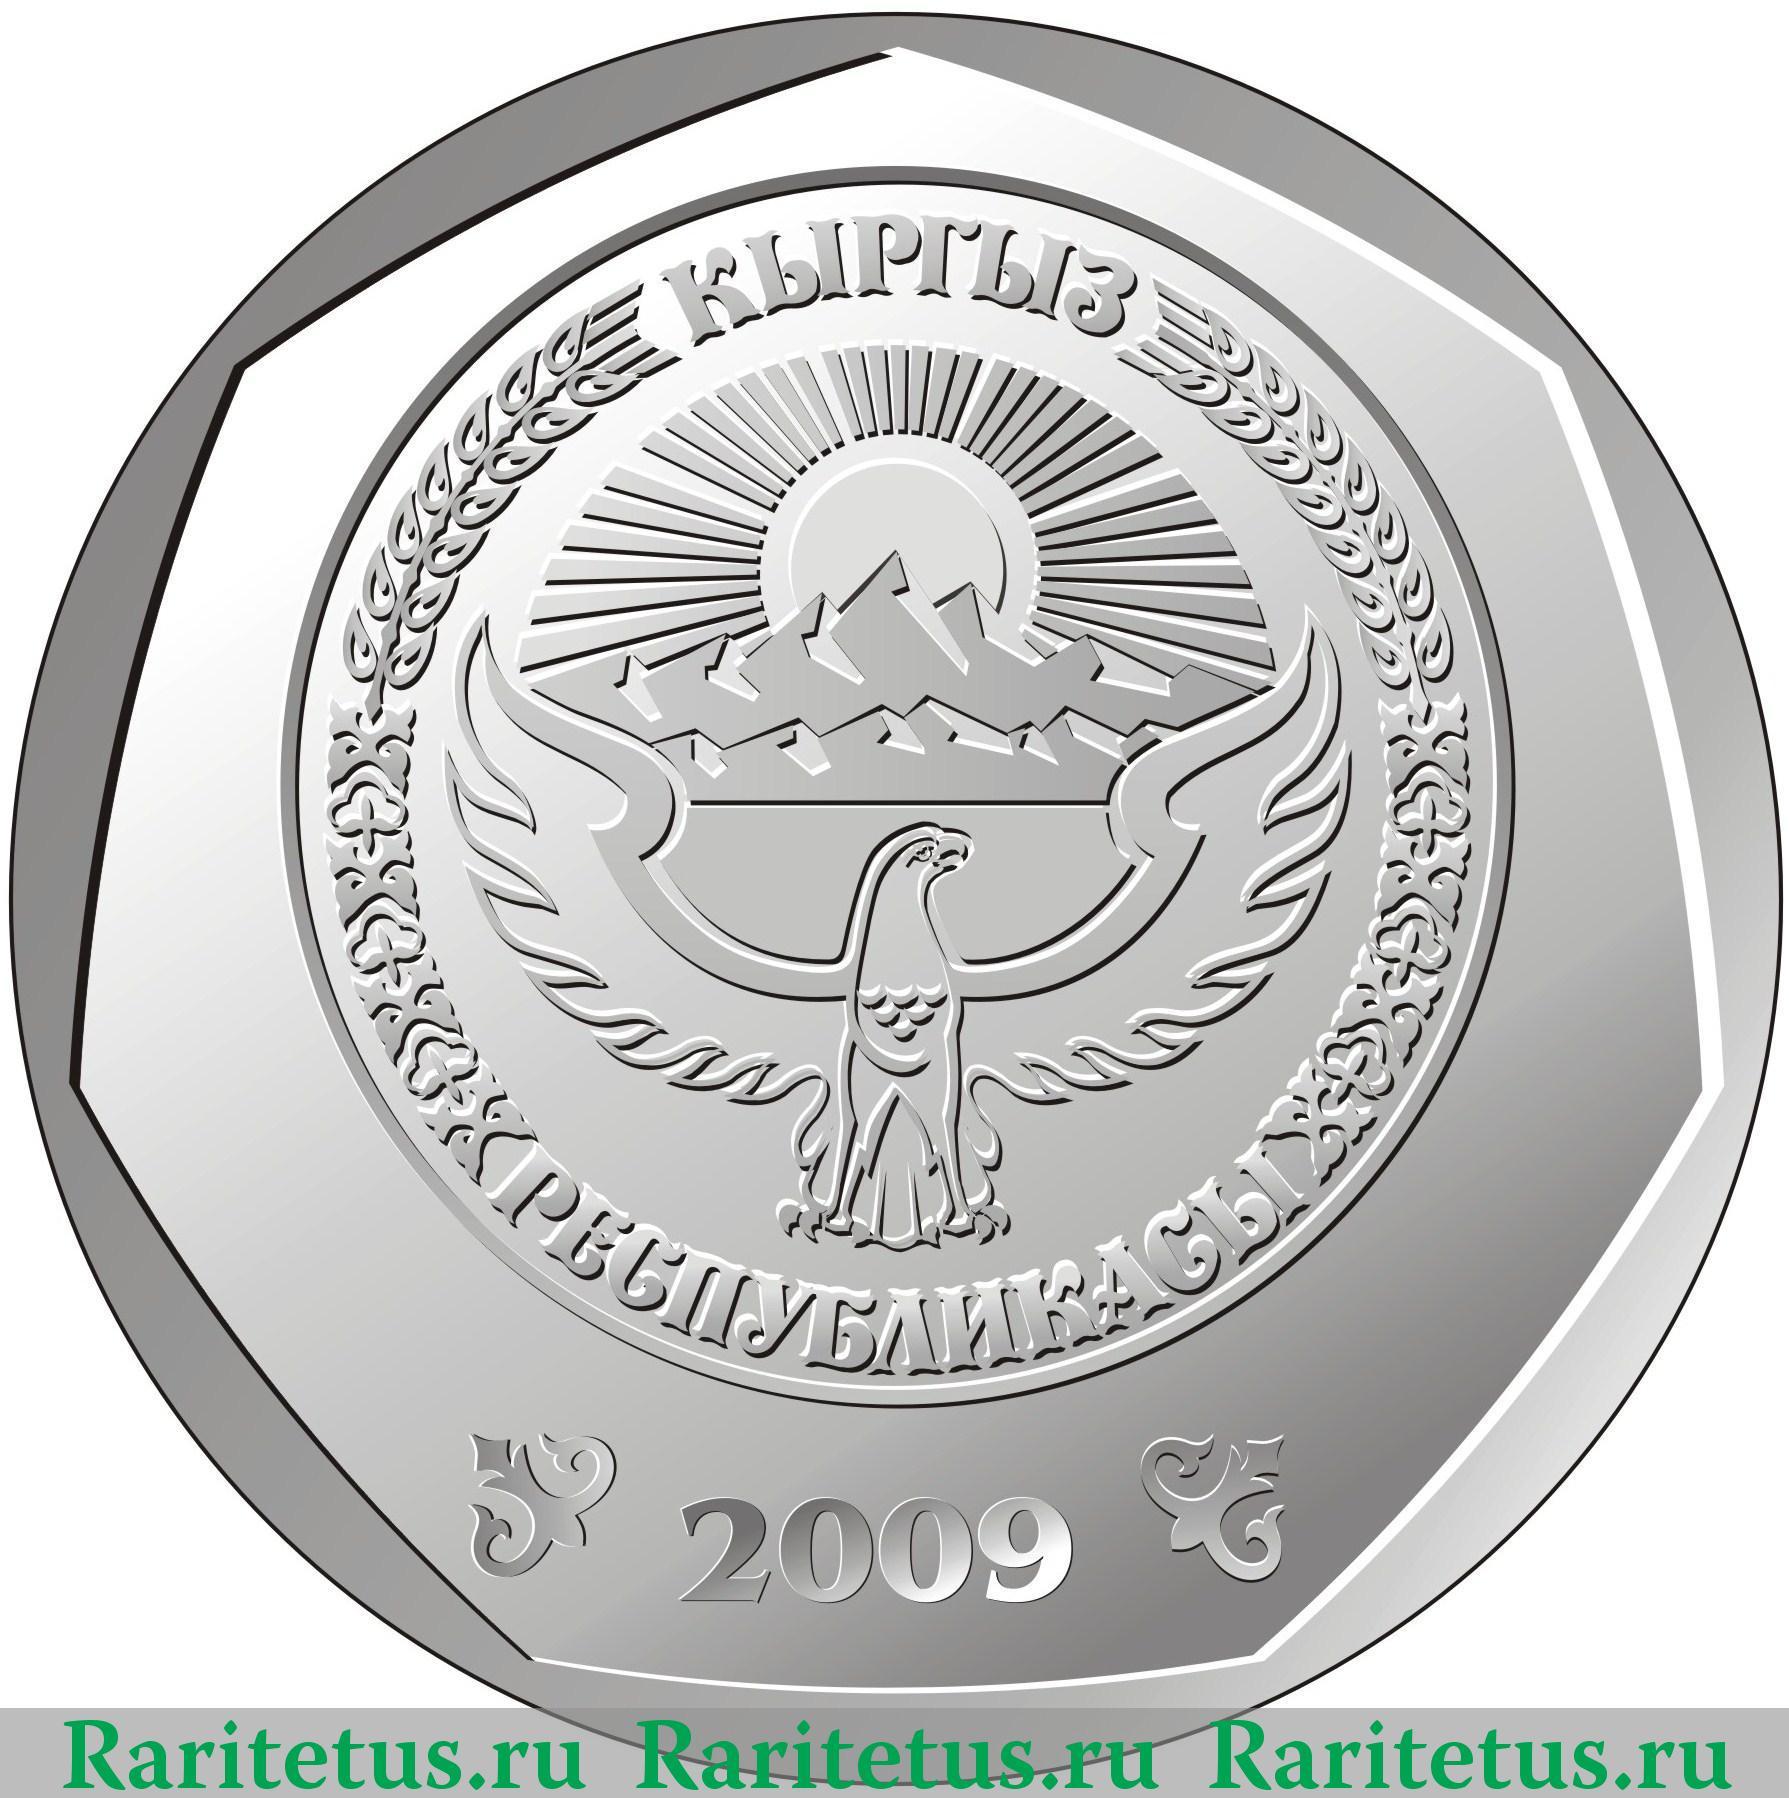 10 сом цена царские монеты опт